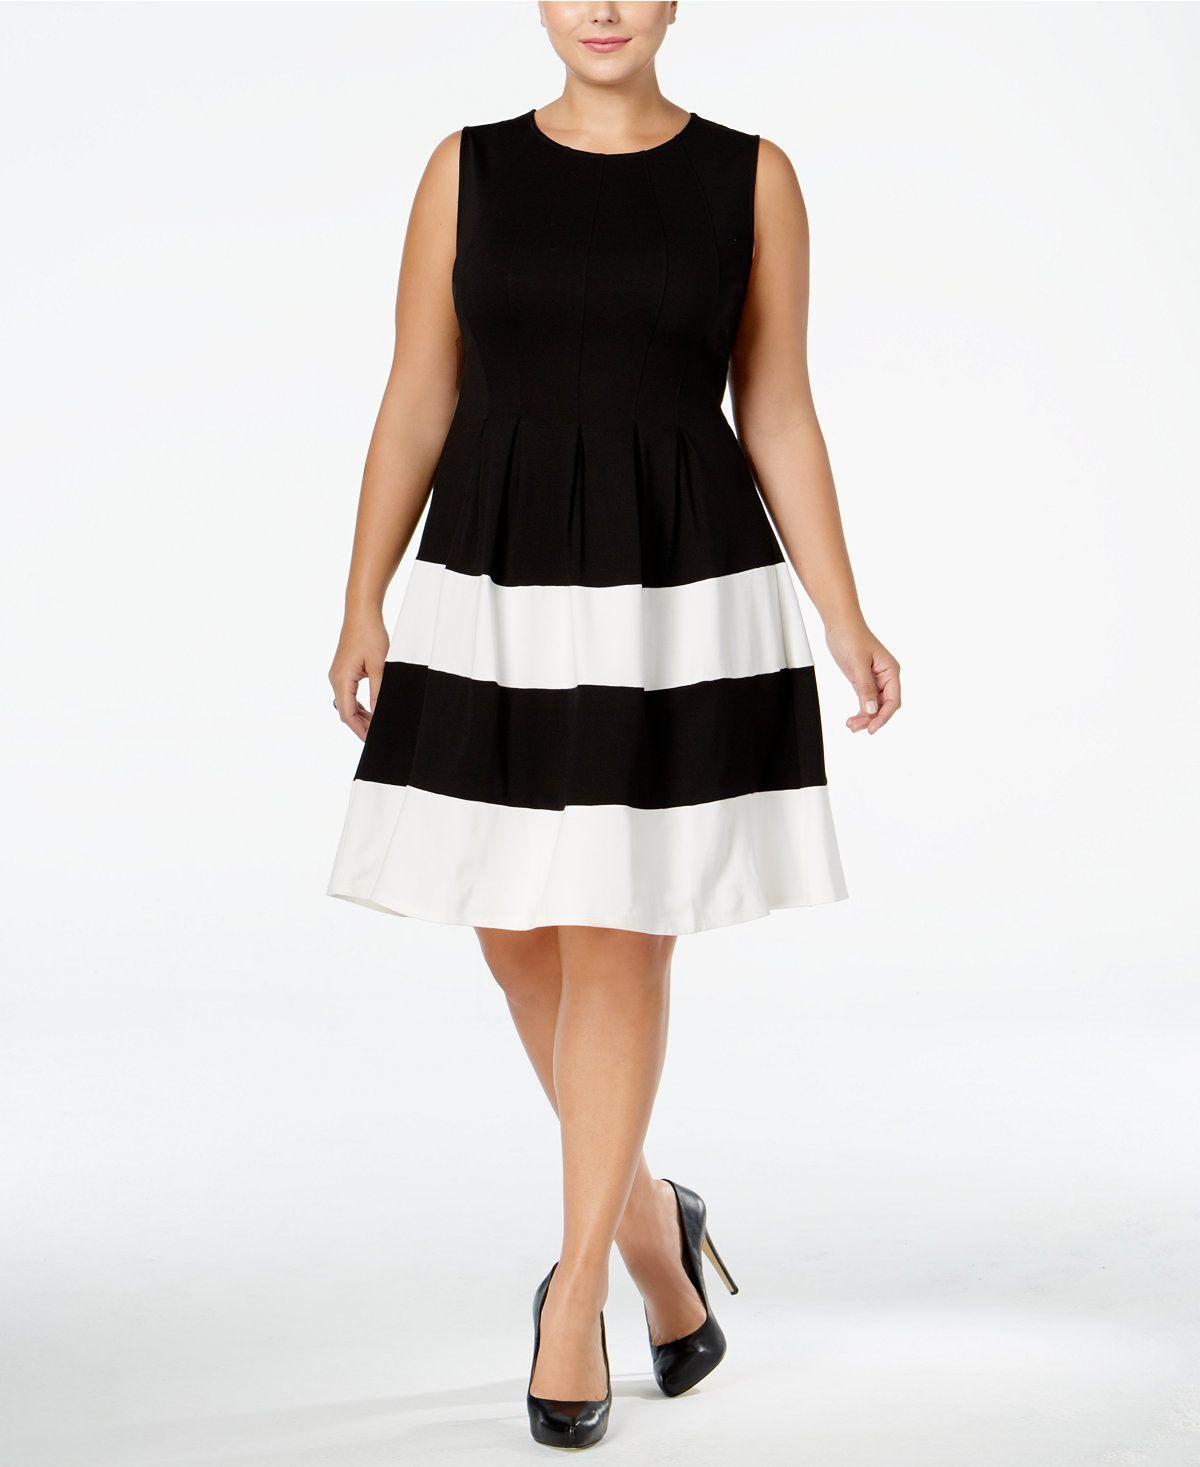 Monteau Trendy Plus Size Fit Flare Dress Dresses Women Macy S Fit Flare Dress Plus Size Dresses Curvy Girl Fashion [ 1467 x 1200 Pixel ]